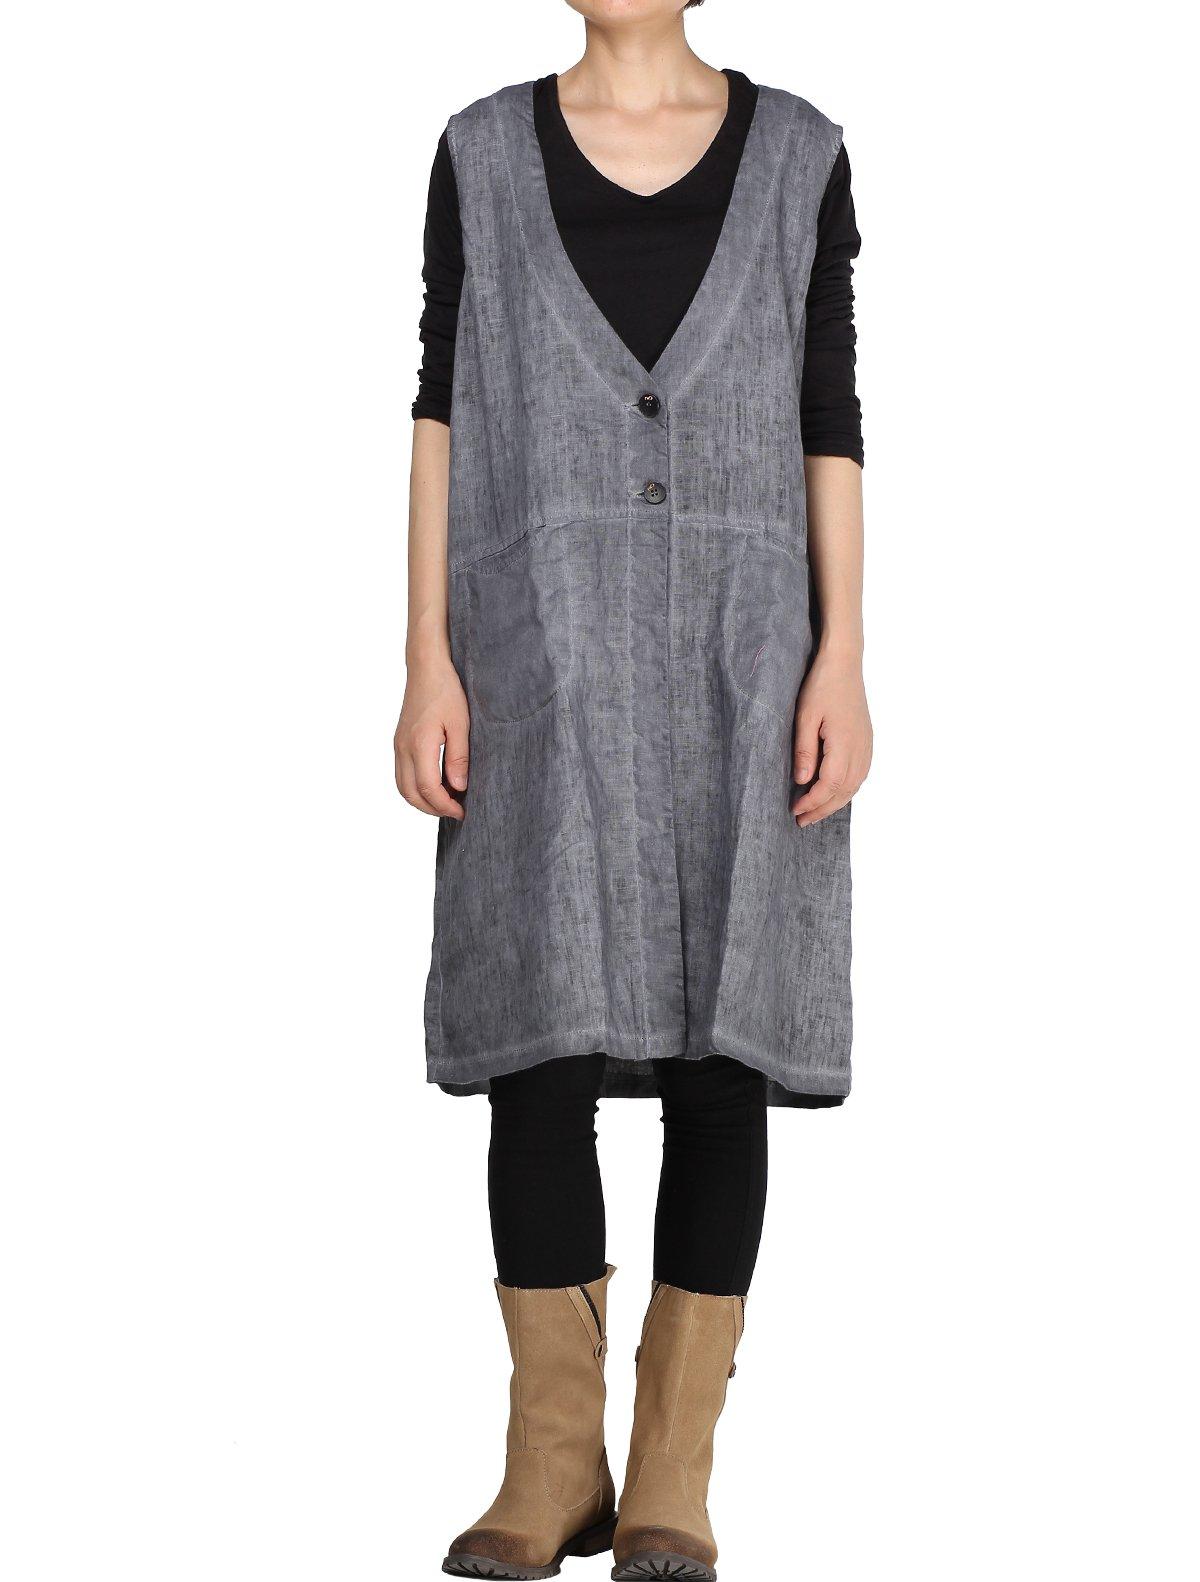 Mordenmiss Women's Sleeveless Vest Casual Blouse Waistcoat Style 3 Gray